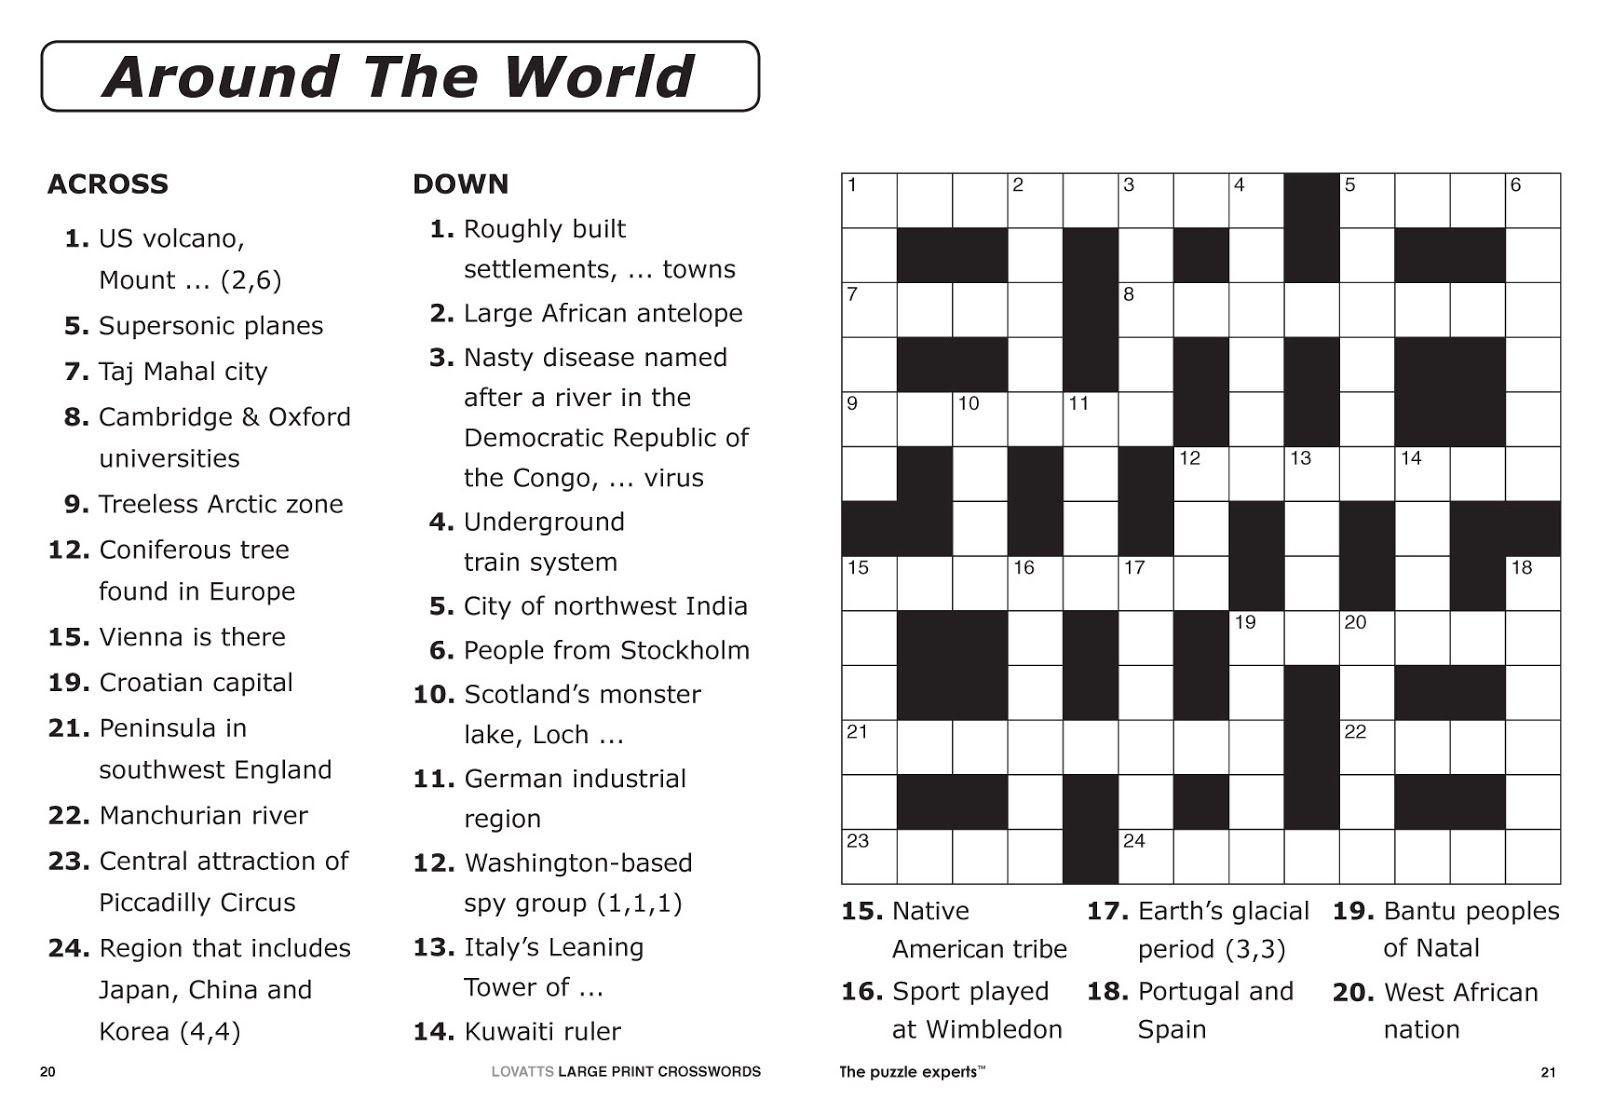 Free Printable Large Print Crossword Puzzles | M3U8 - Printable Crossword Free